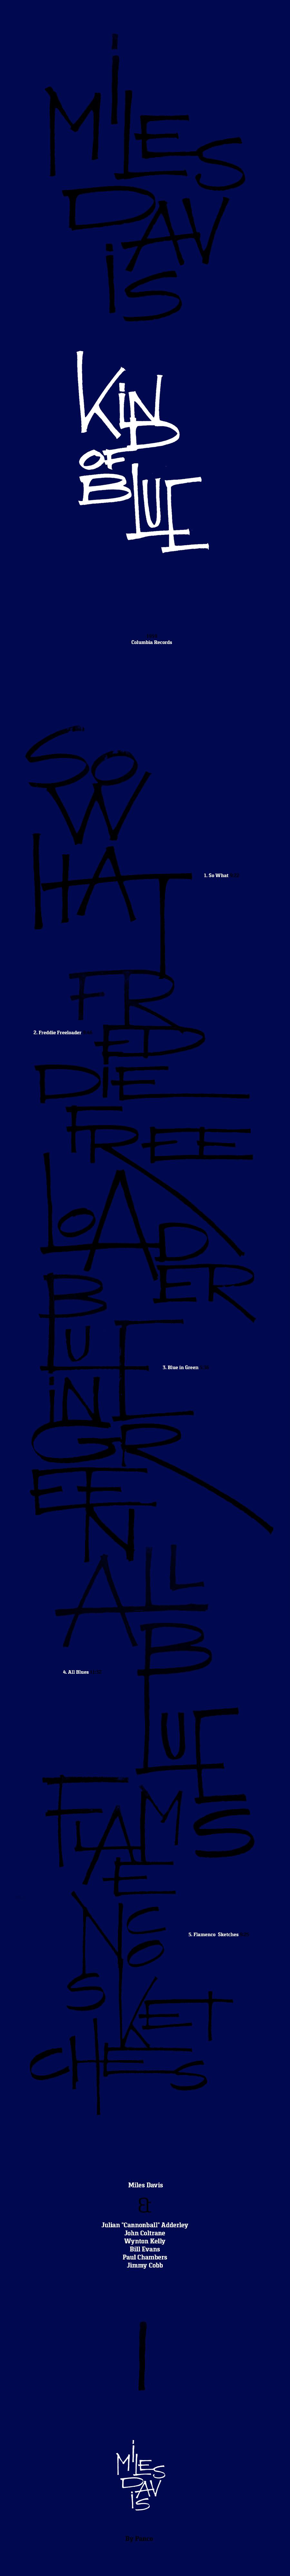 miles lettering blue blues minimal davis jazz kind of blue experimental